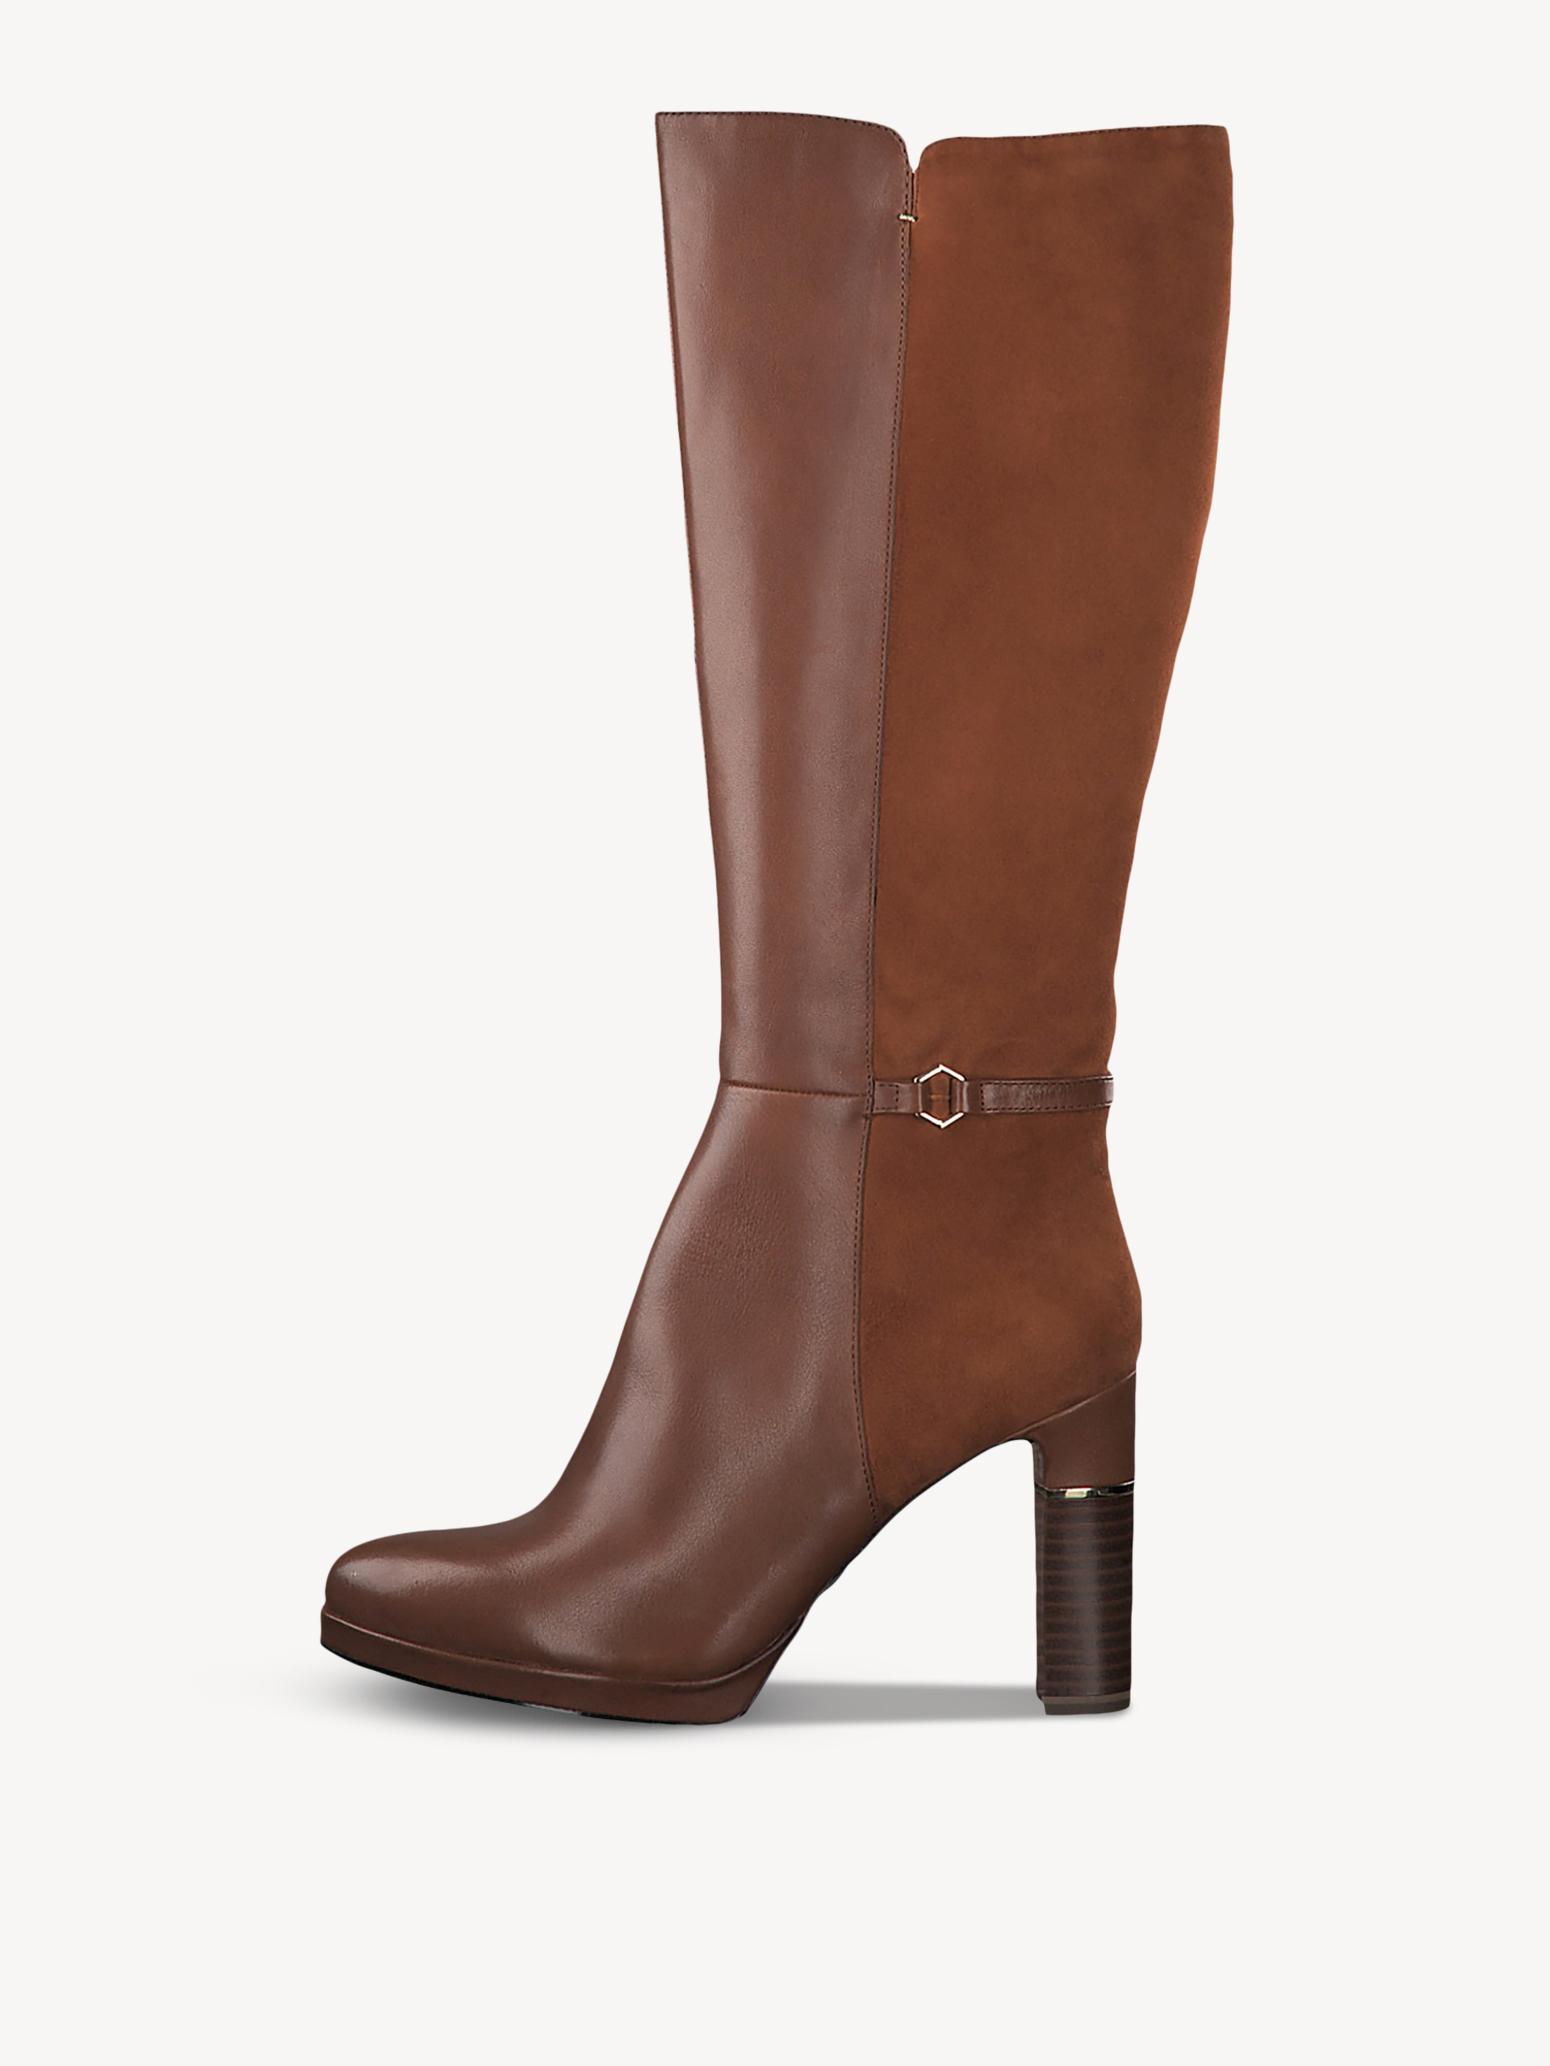 Tamaris – Stiefel aus Leder – Cognac